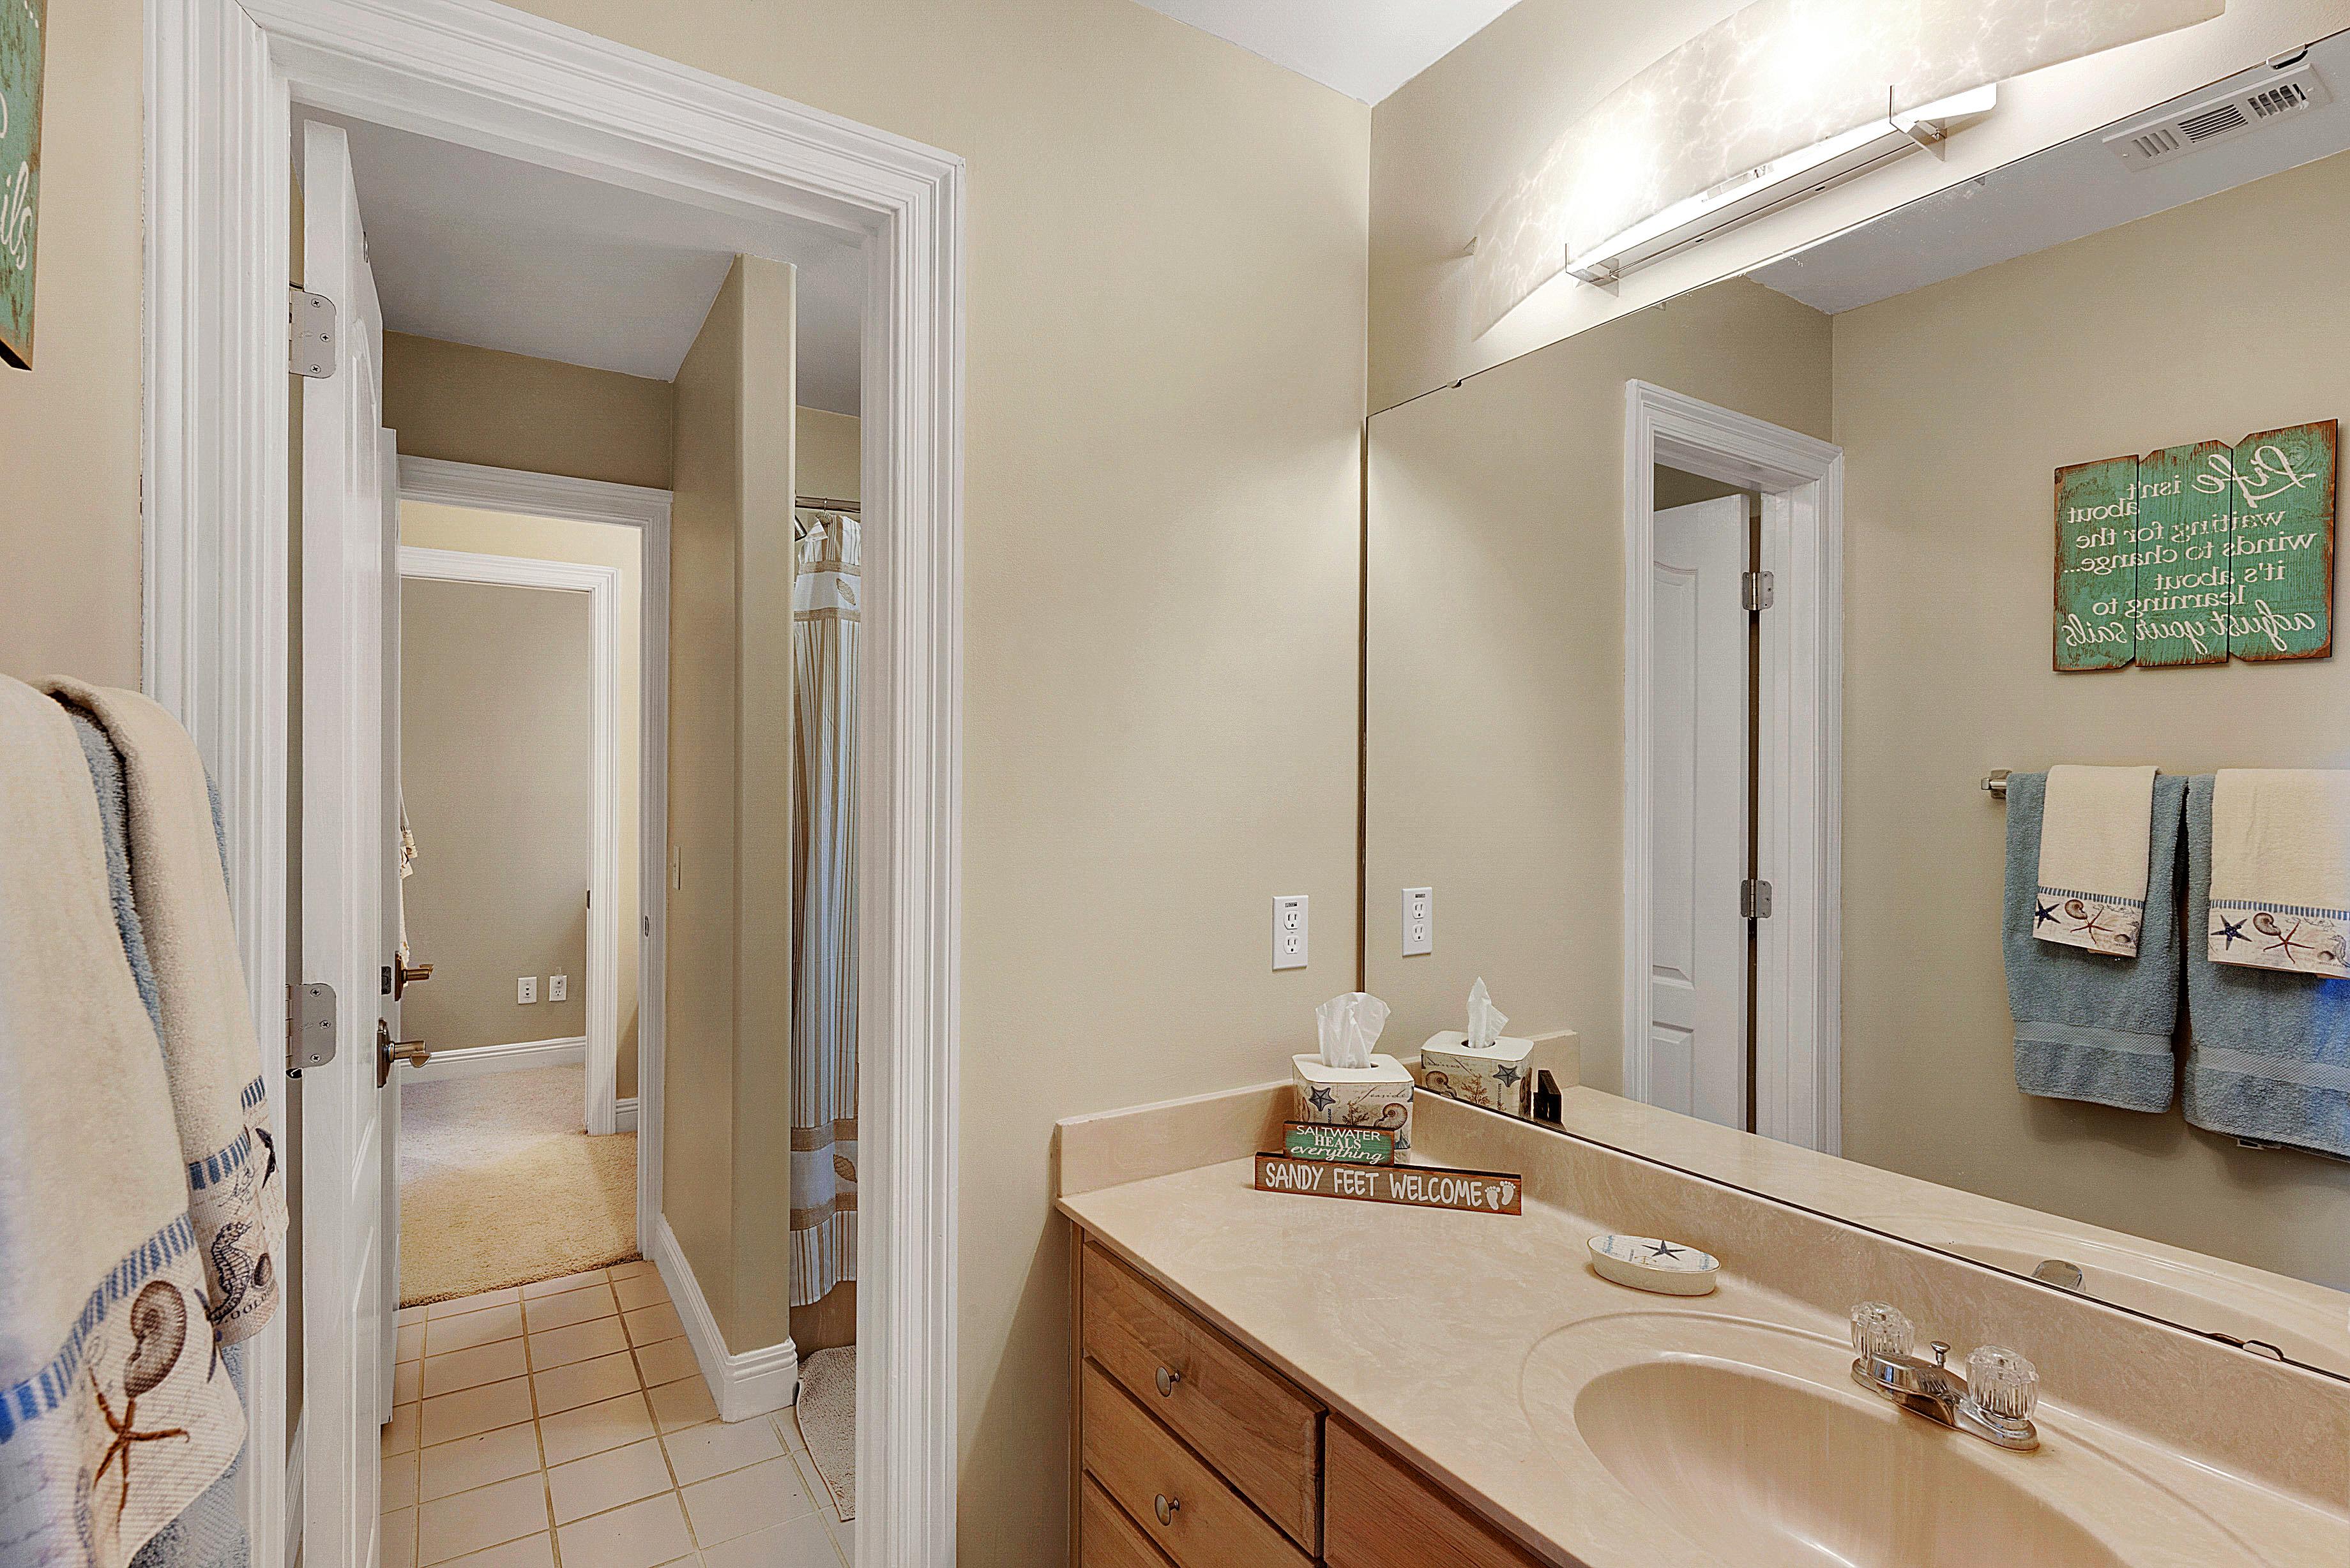 edit real estate photos professionally | Fiverr